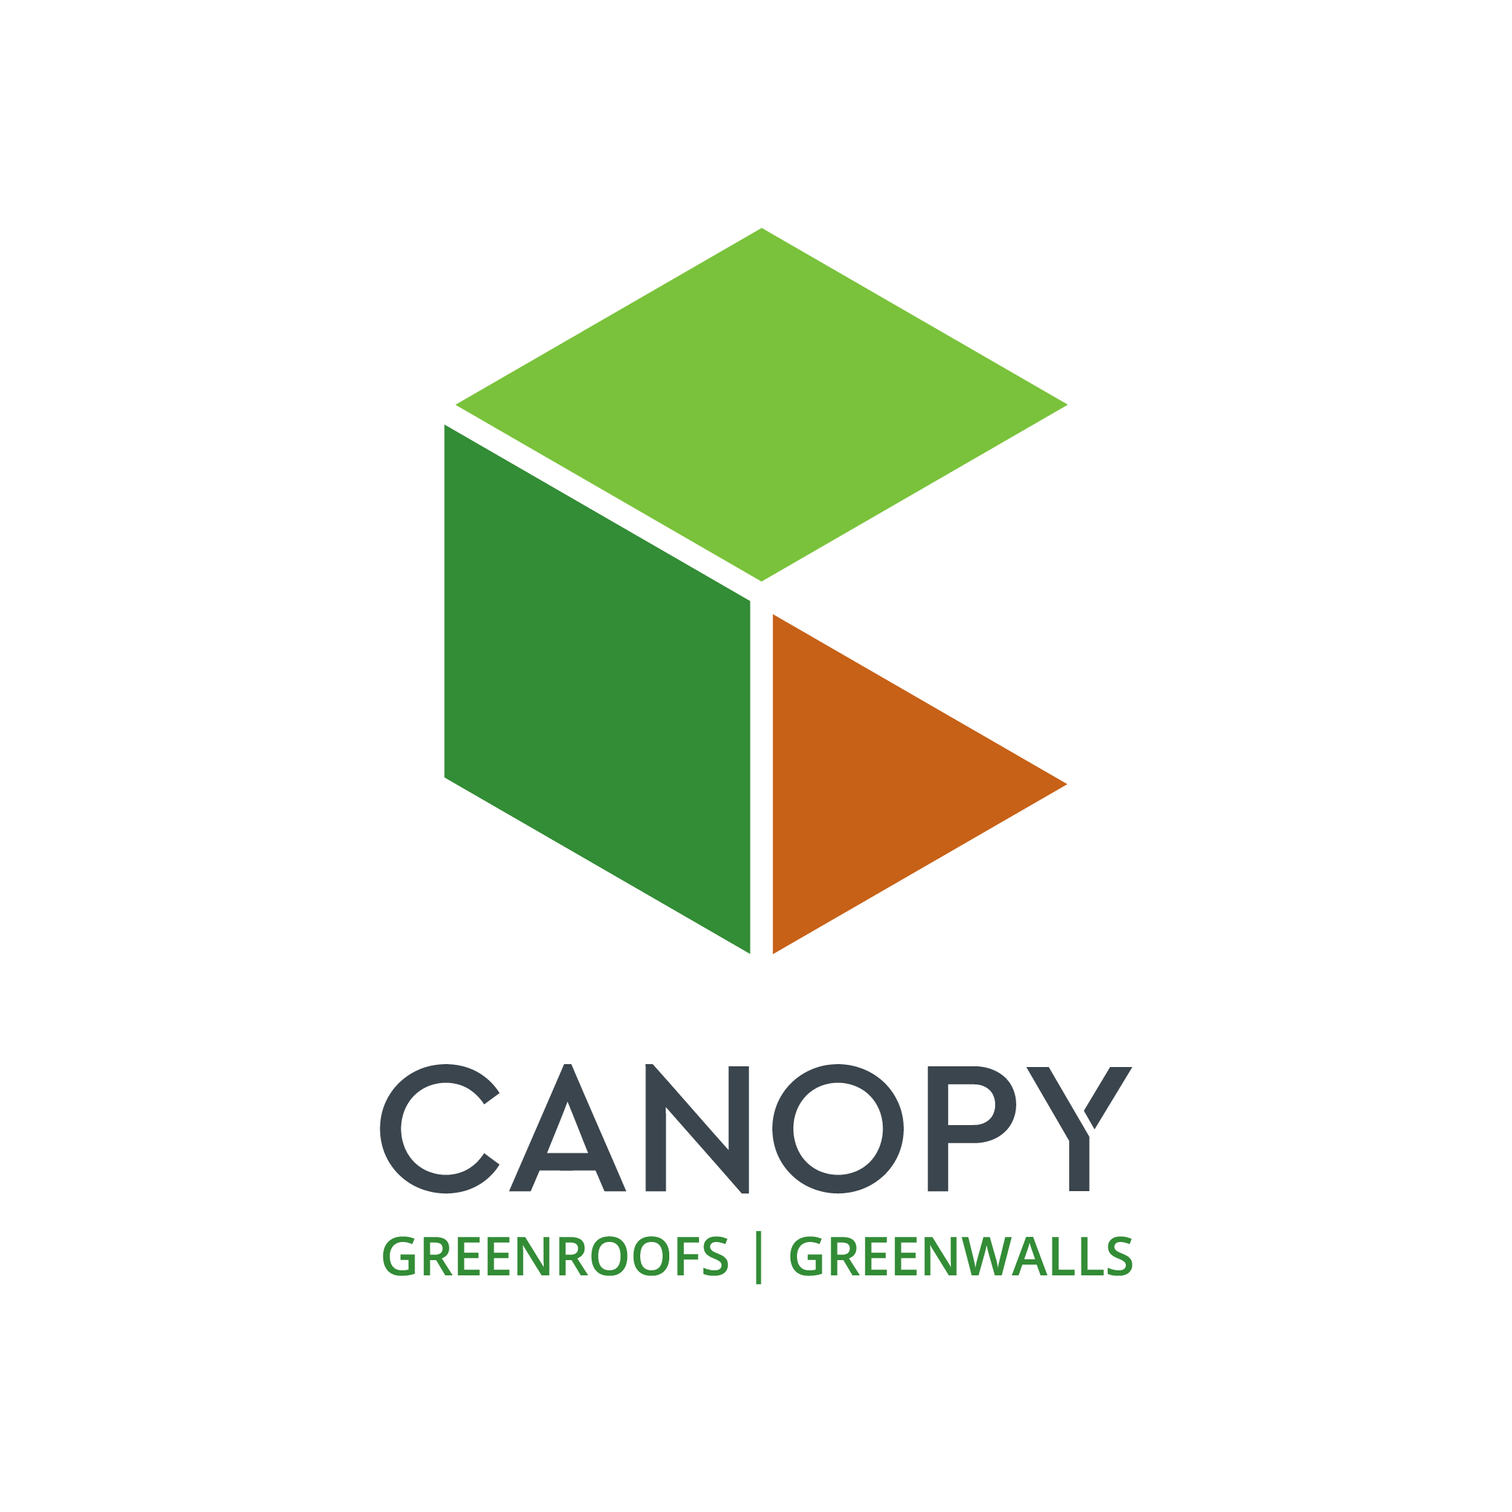 Canopy bv logo